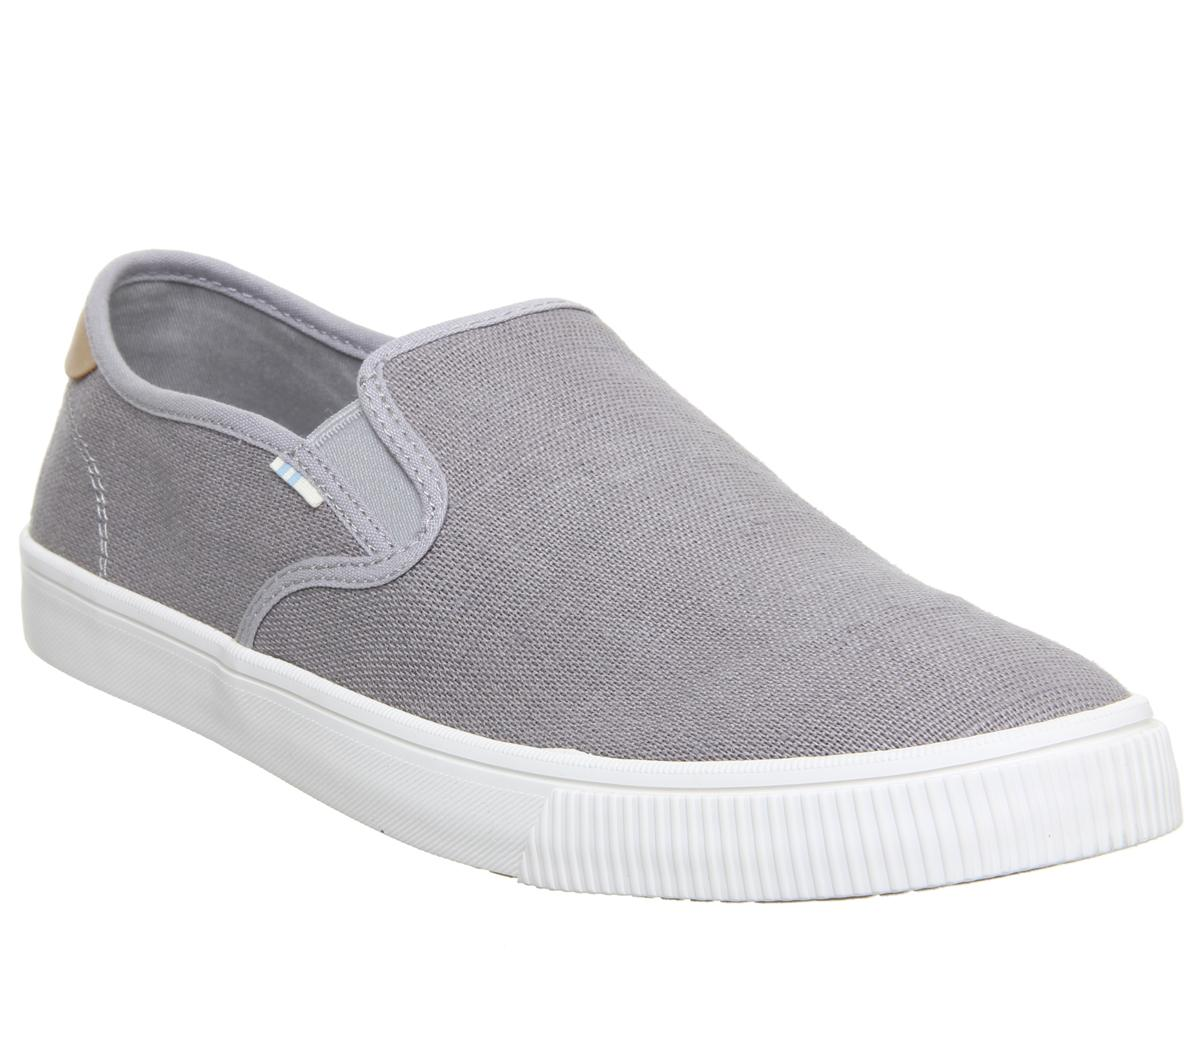 Toms Baja Slip Ons Drizzle Grey